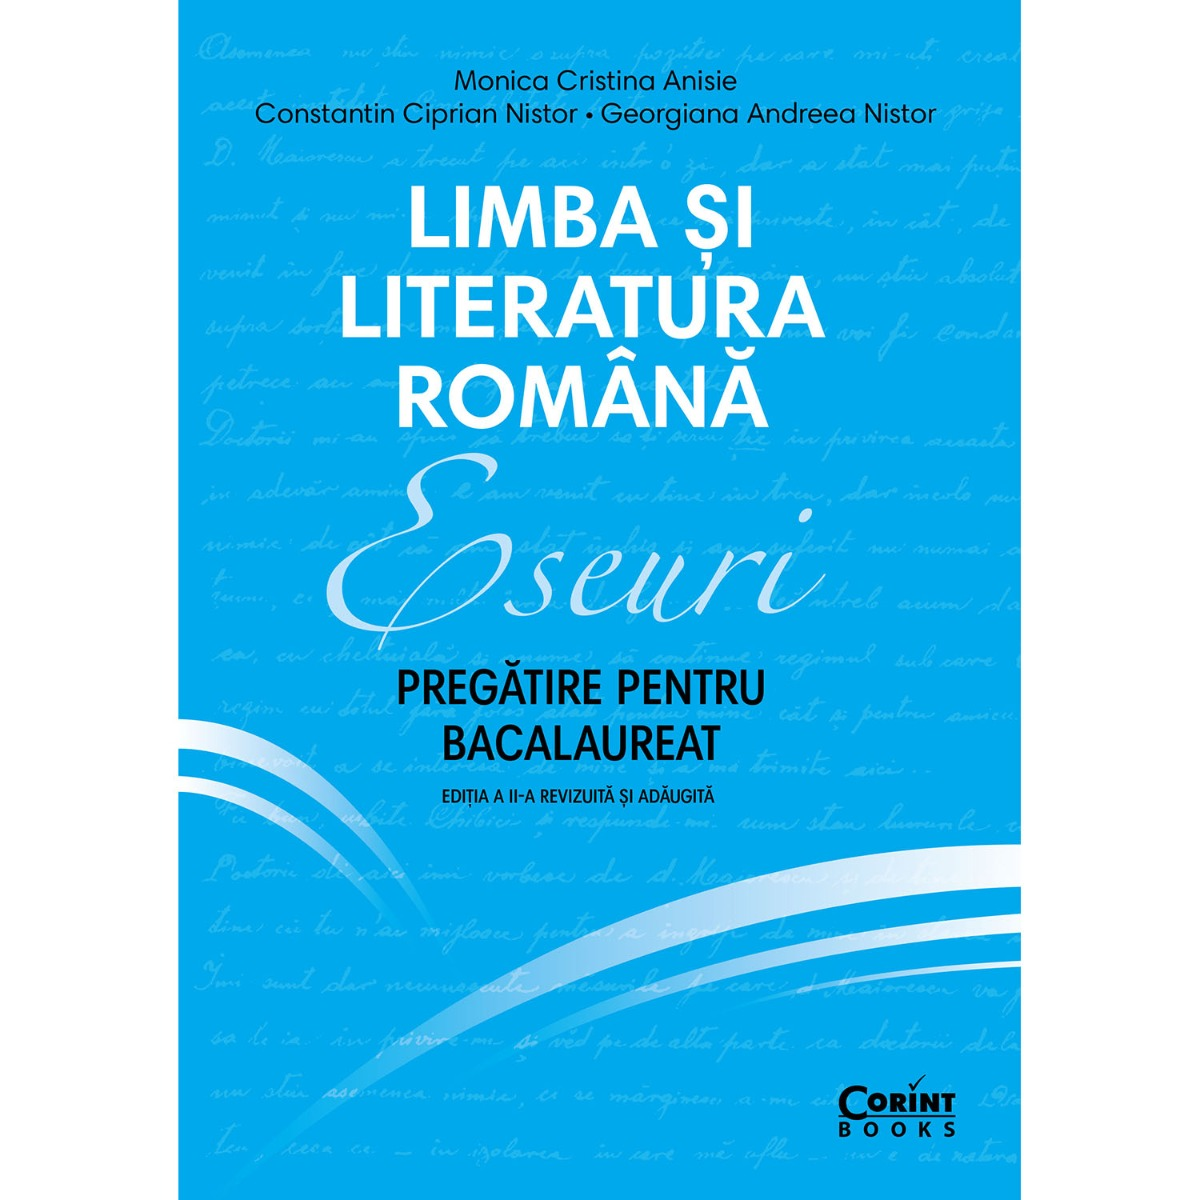 Limba si literatura romana, Eseuri, Pregatire pentru bacalaureat, Ed. II, Monica Cristina Anisie